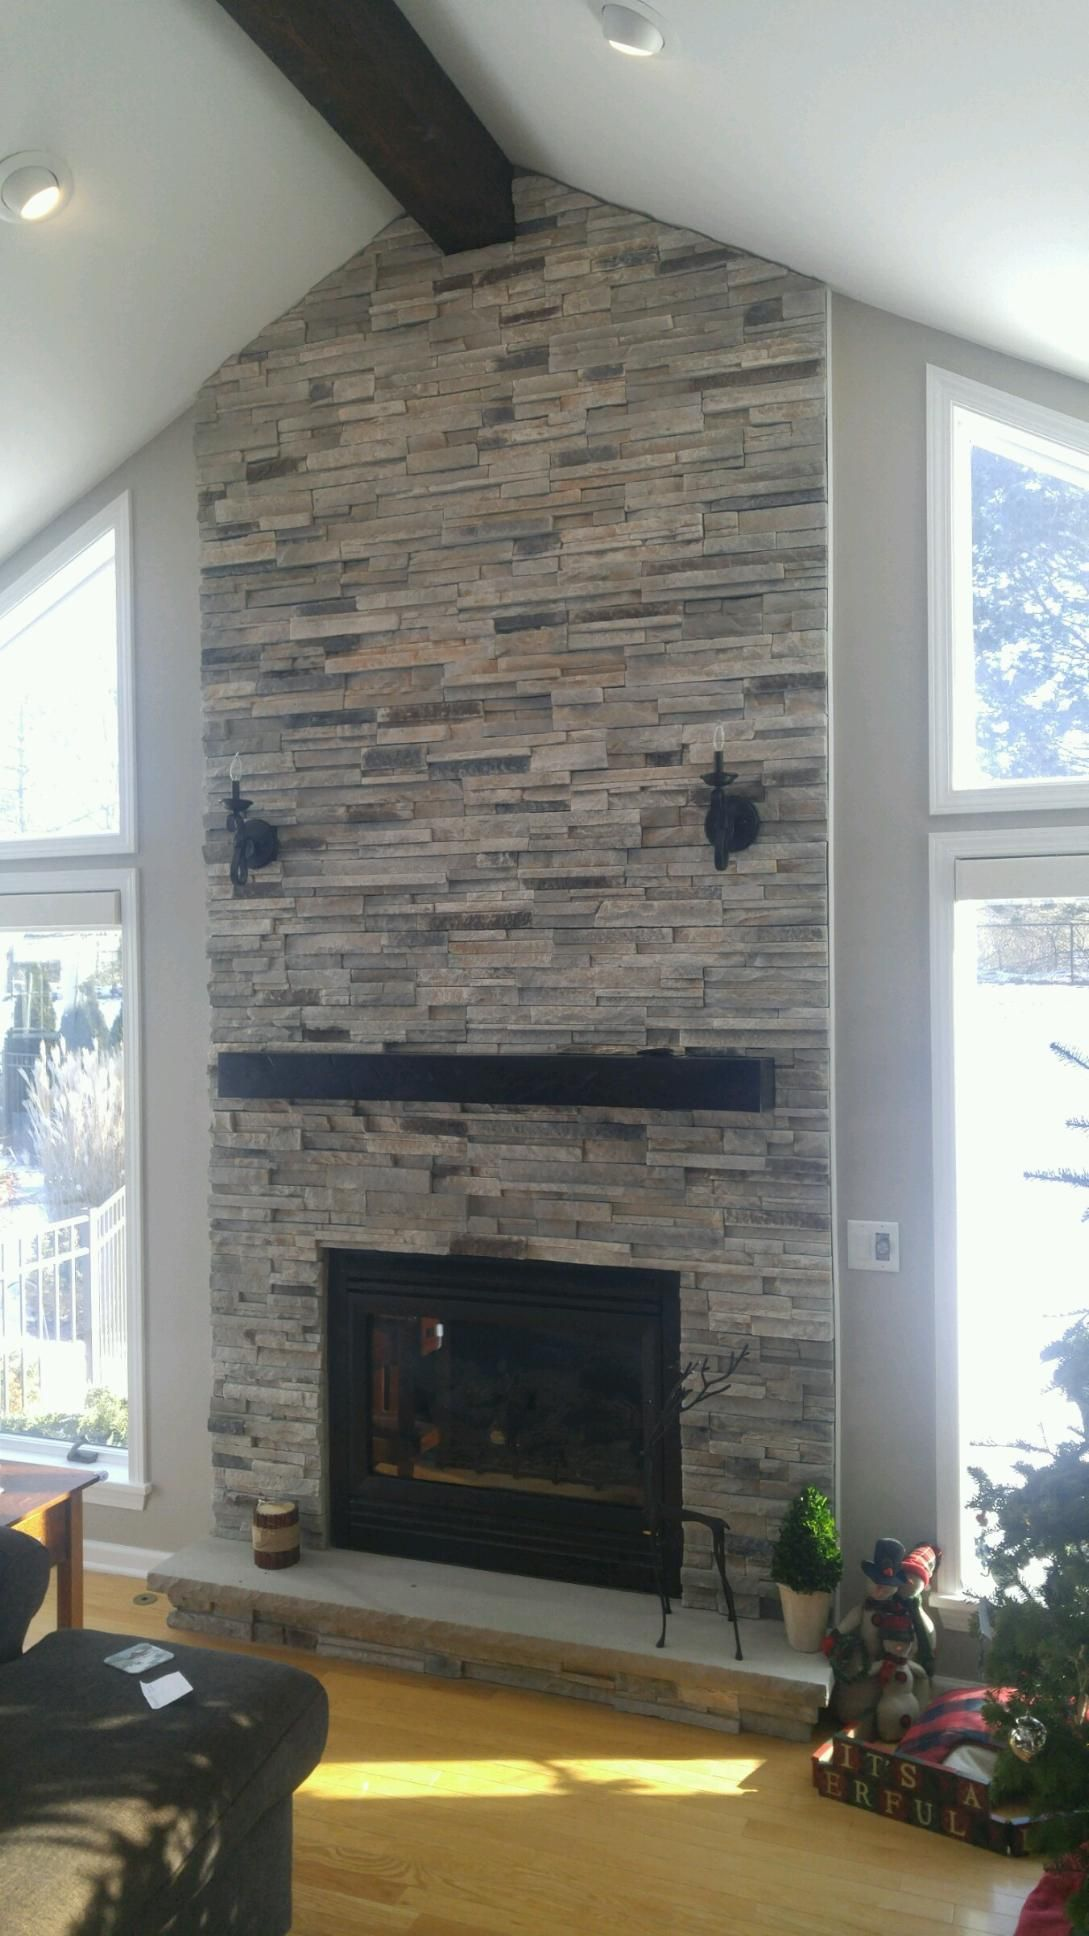 Boral Echo Ridge Alpine Ledgestone Fireplace Surround